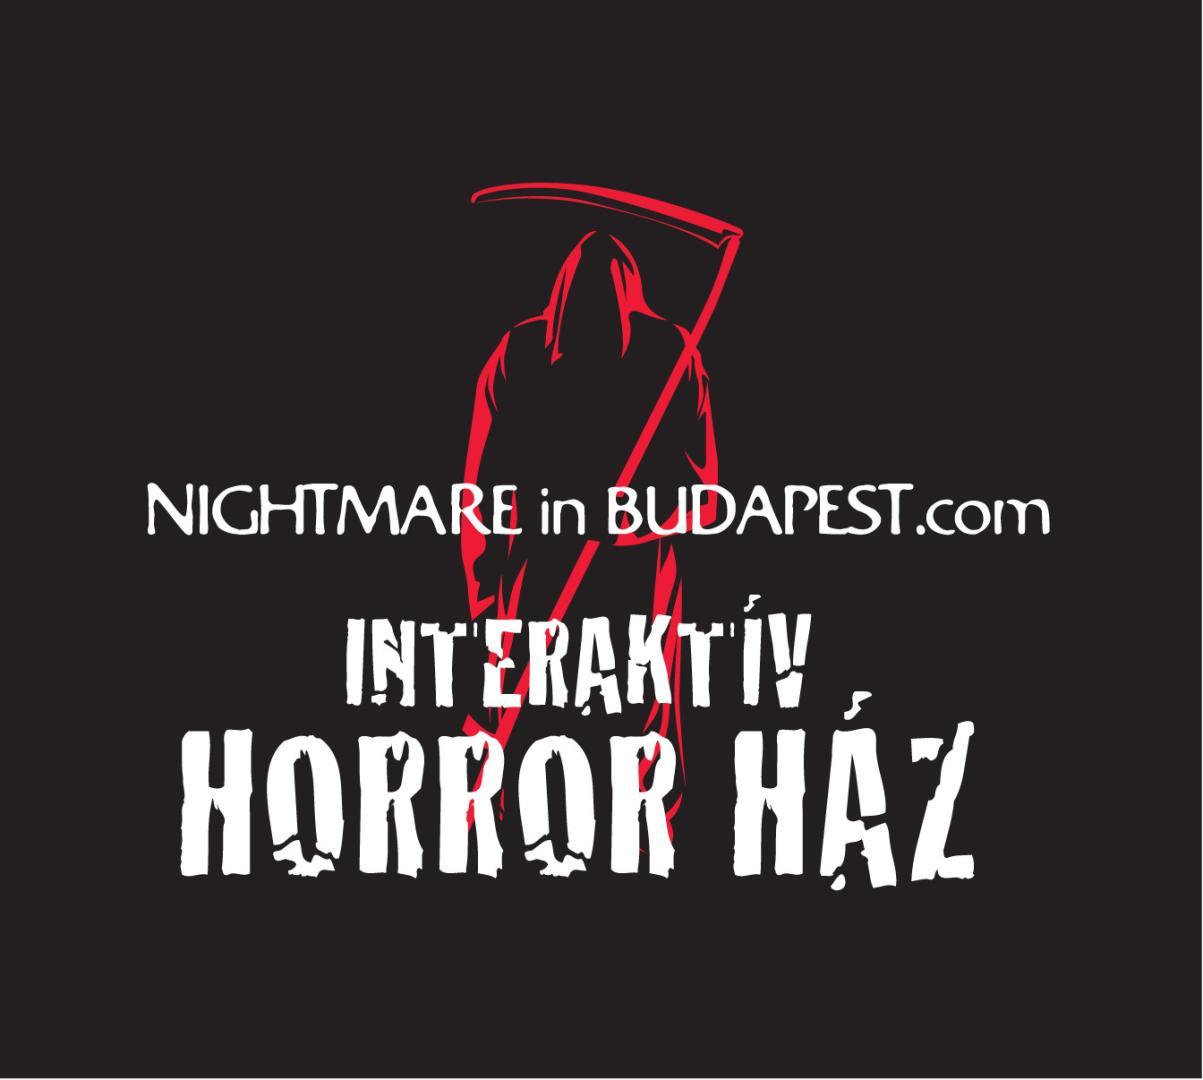 Nightmare in Budapest